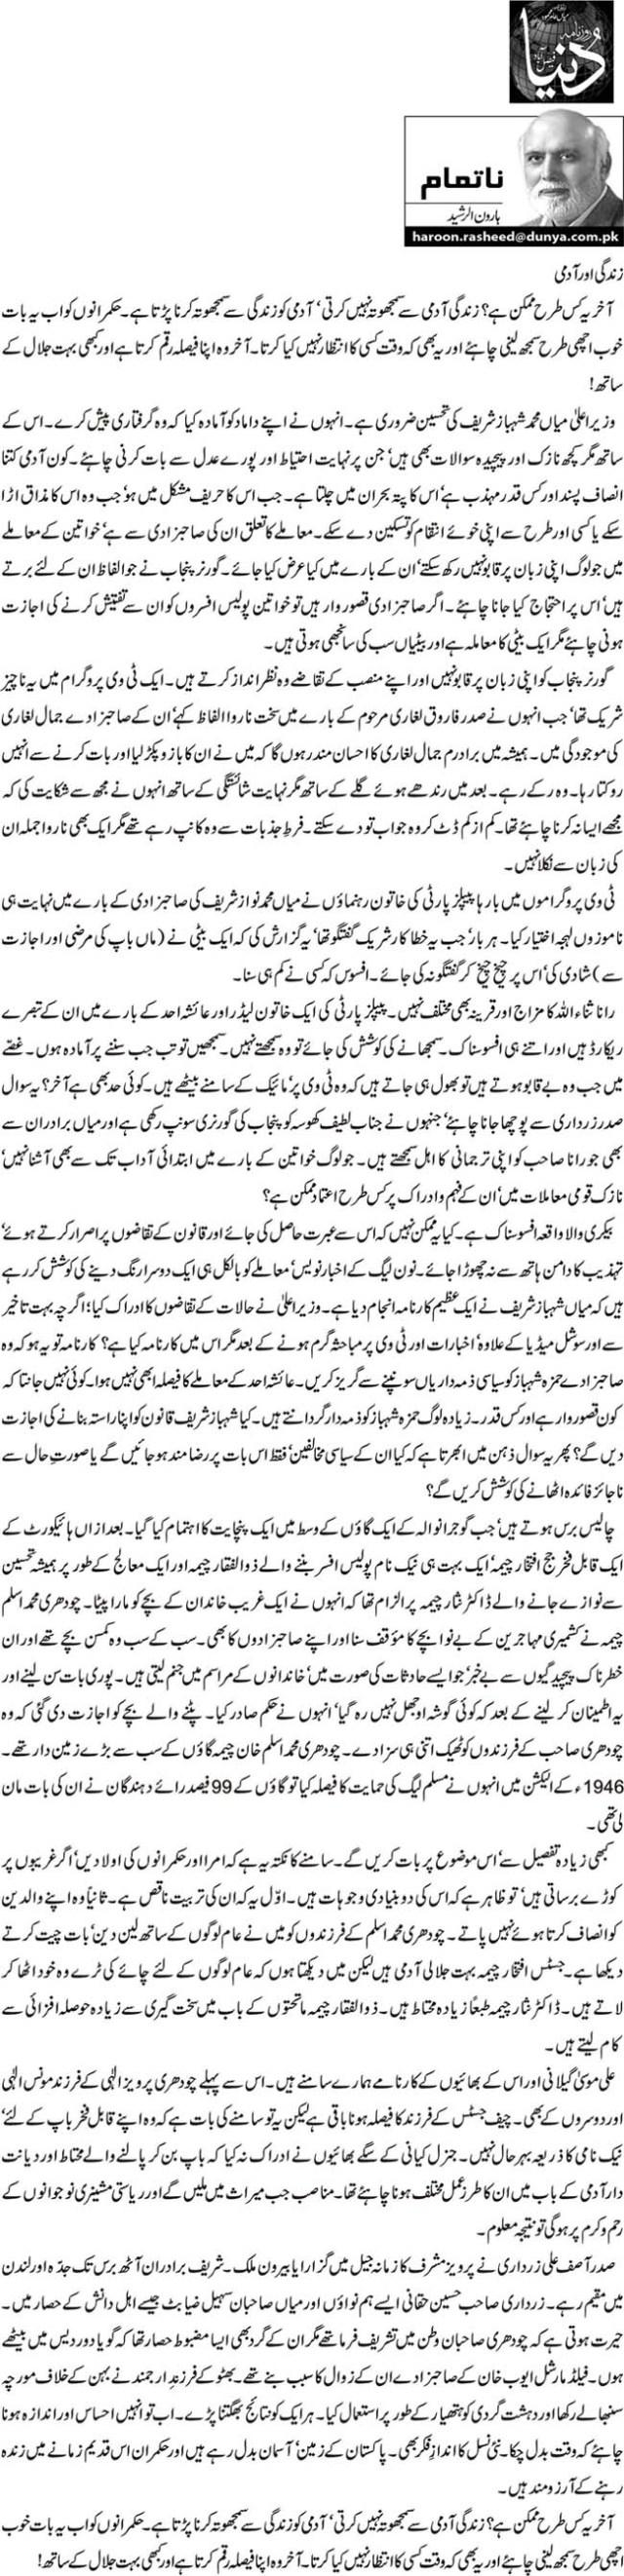 Zindgi aur Admi - Haroon-ur-Rasheed